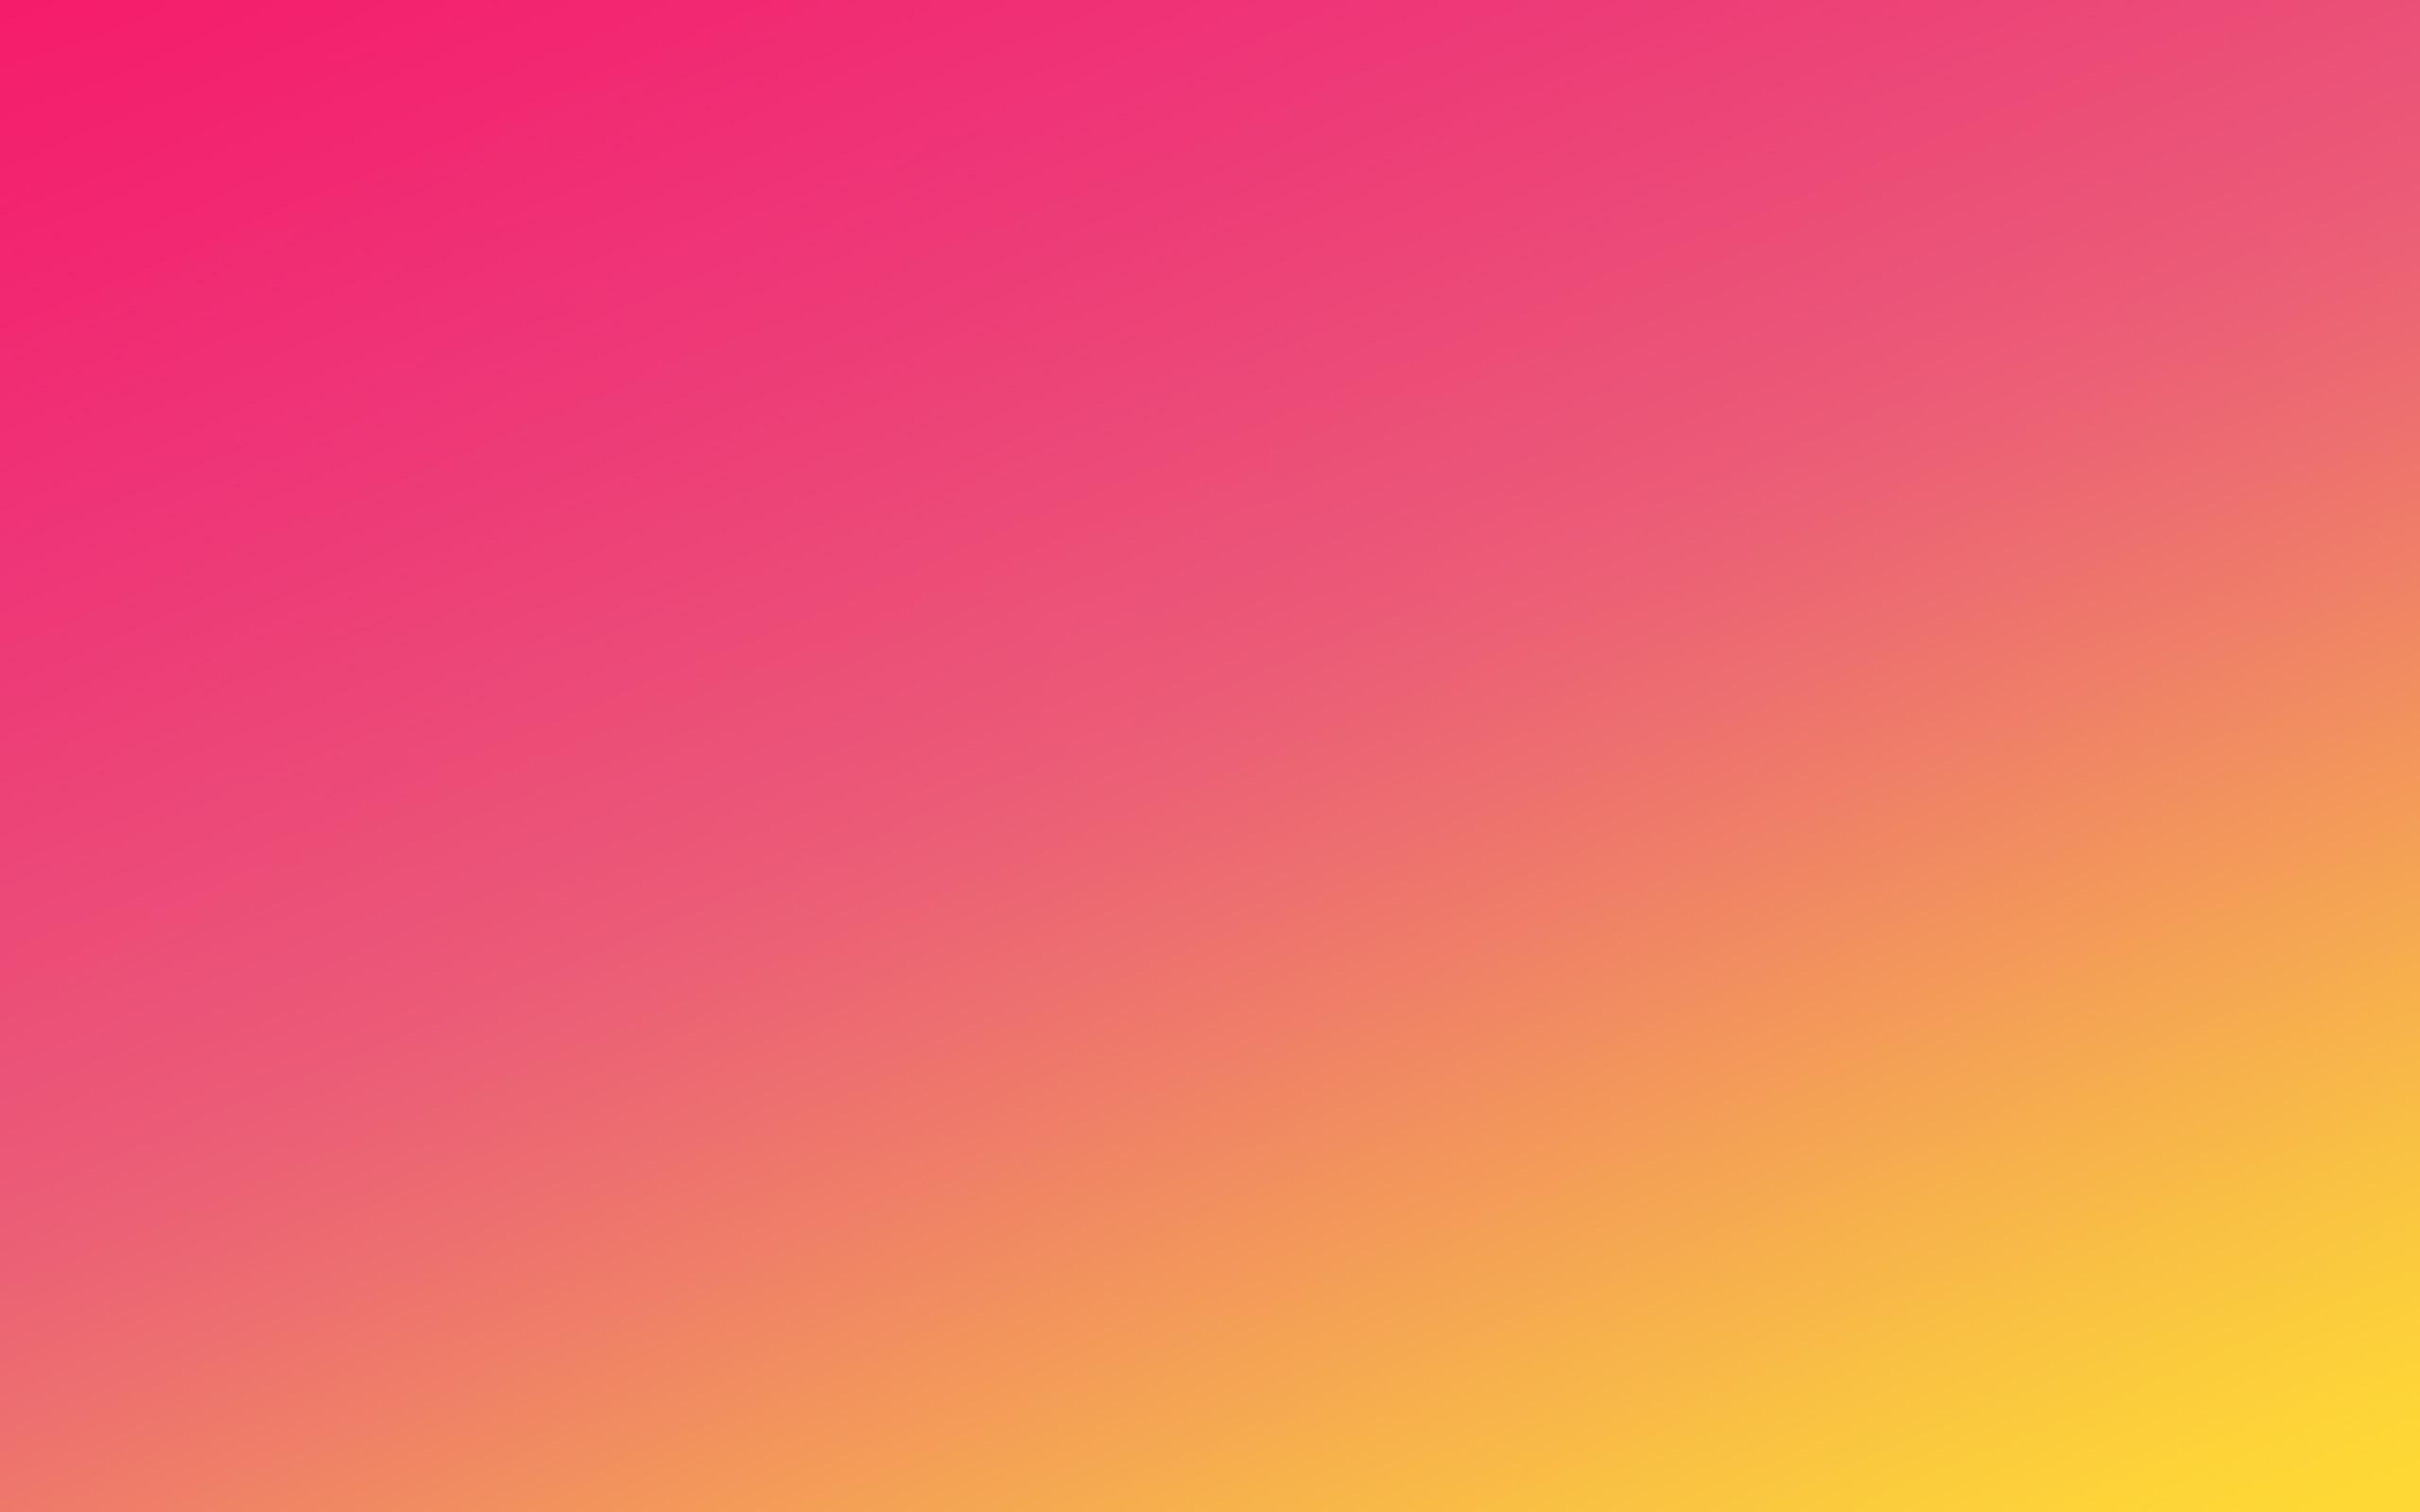 Cute Pastel Color Wallpaper Sl78 Red Yellow Summer Blur Gradation Wallpaper